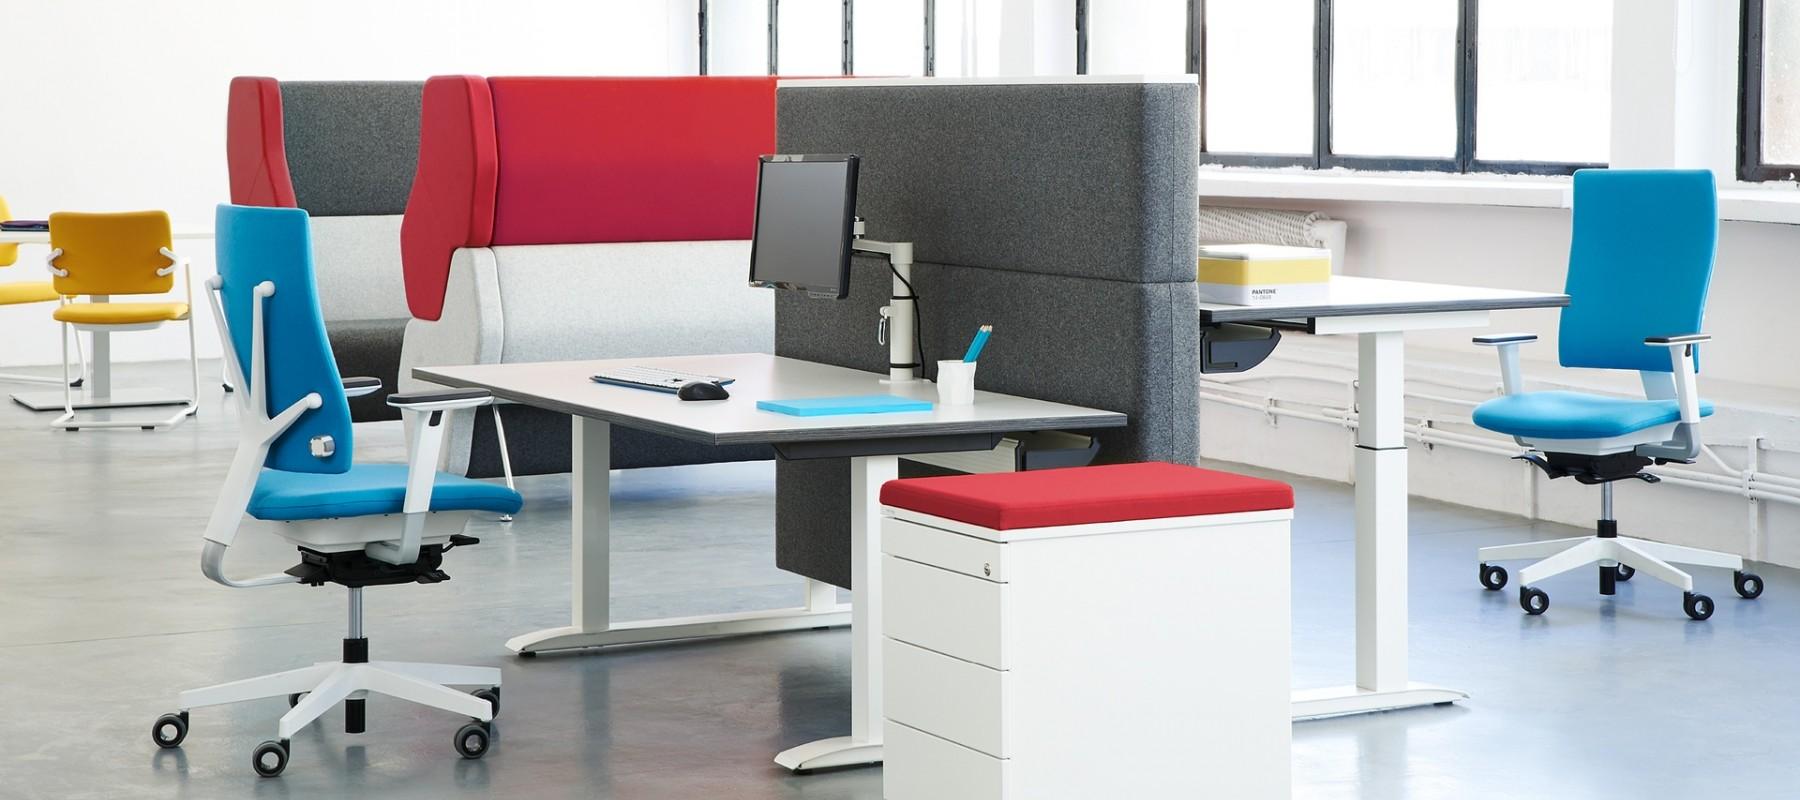 fotele-krzesla-siedziska-4me-2me-aranzacje01